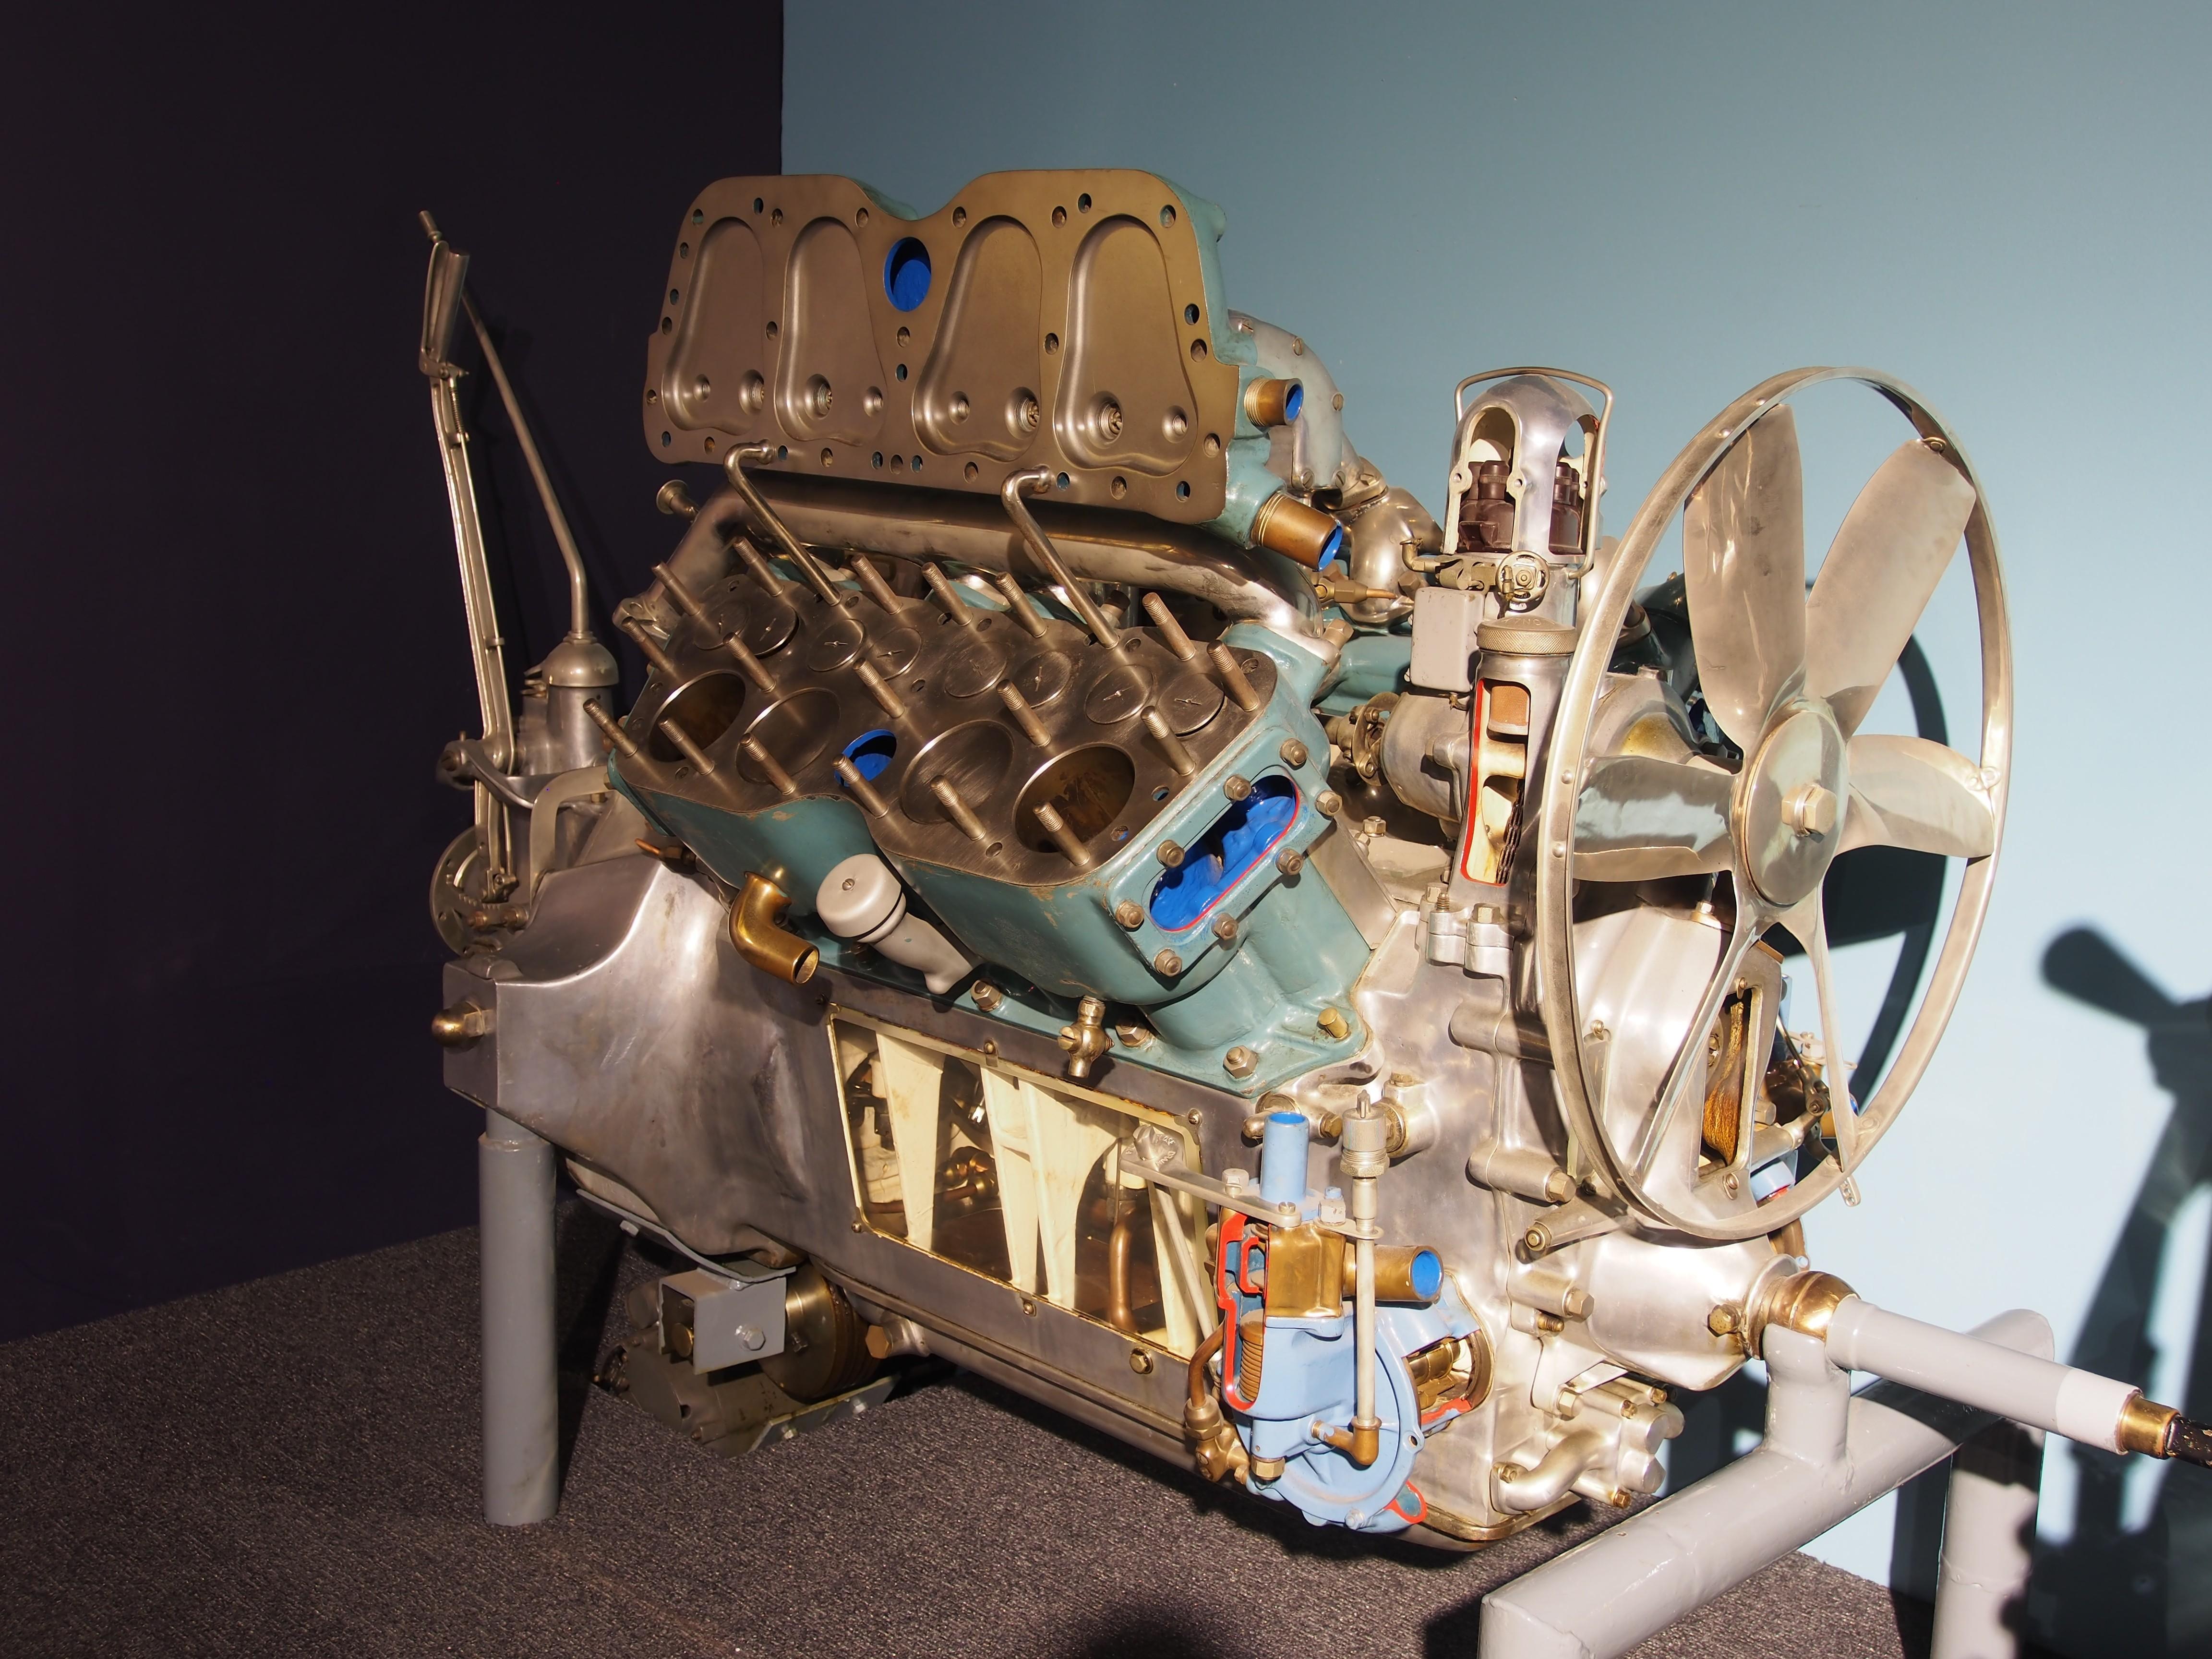 Cadillac V8 engine